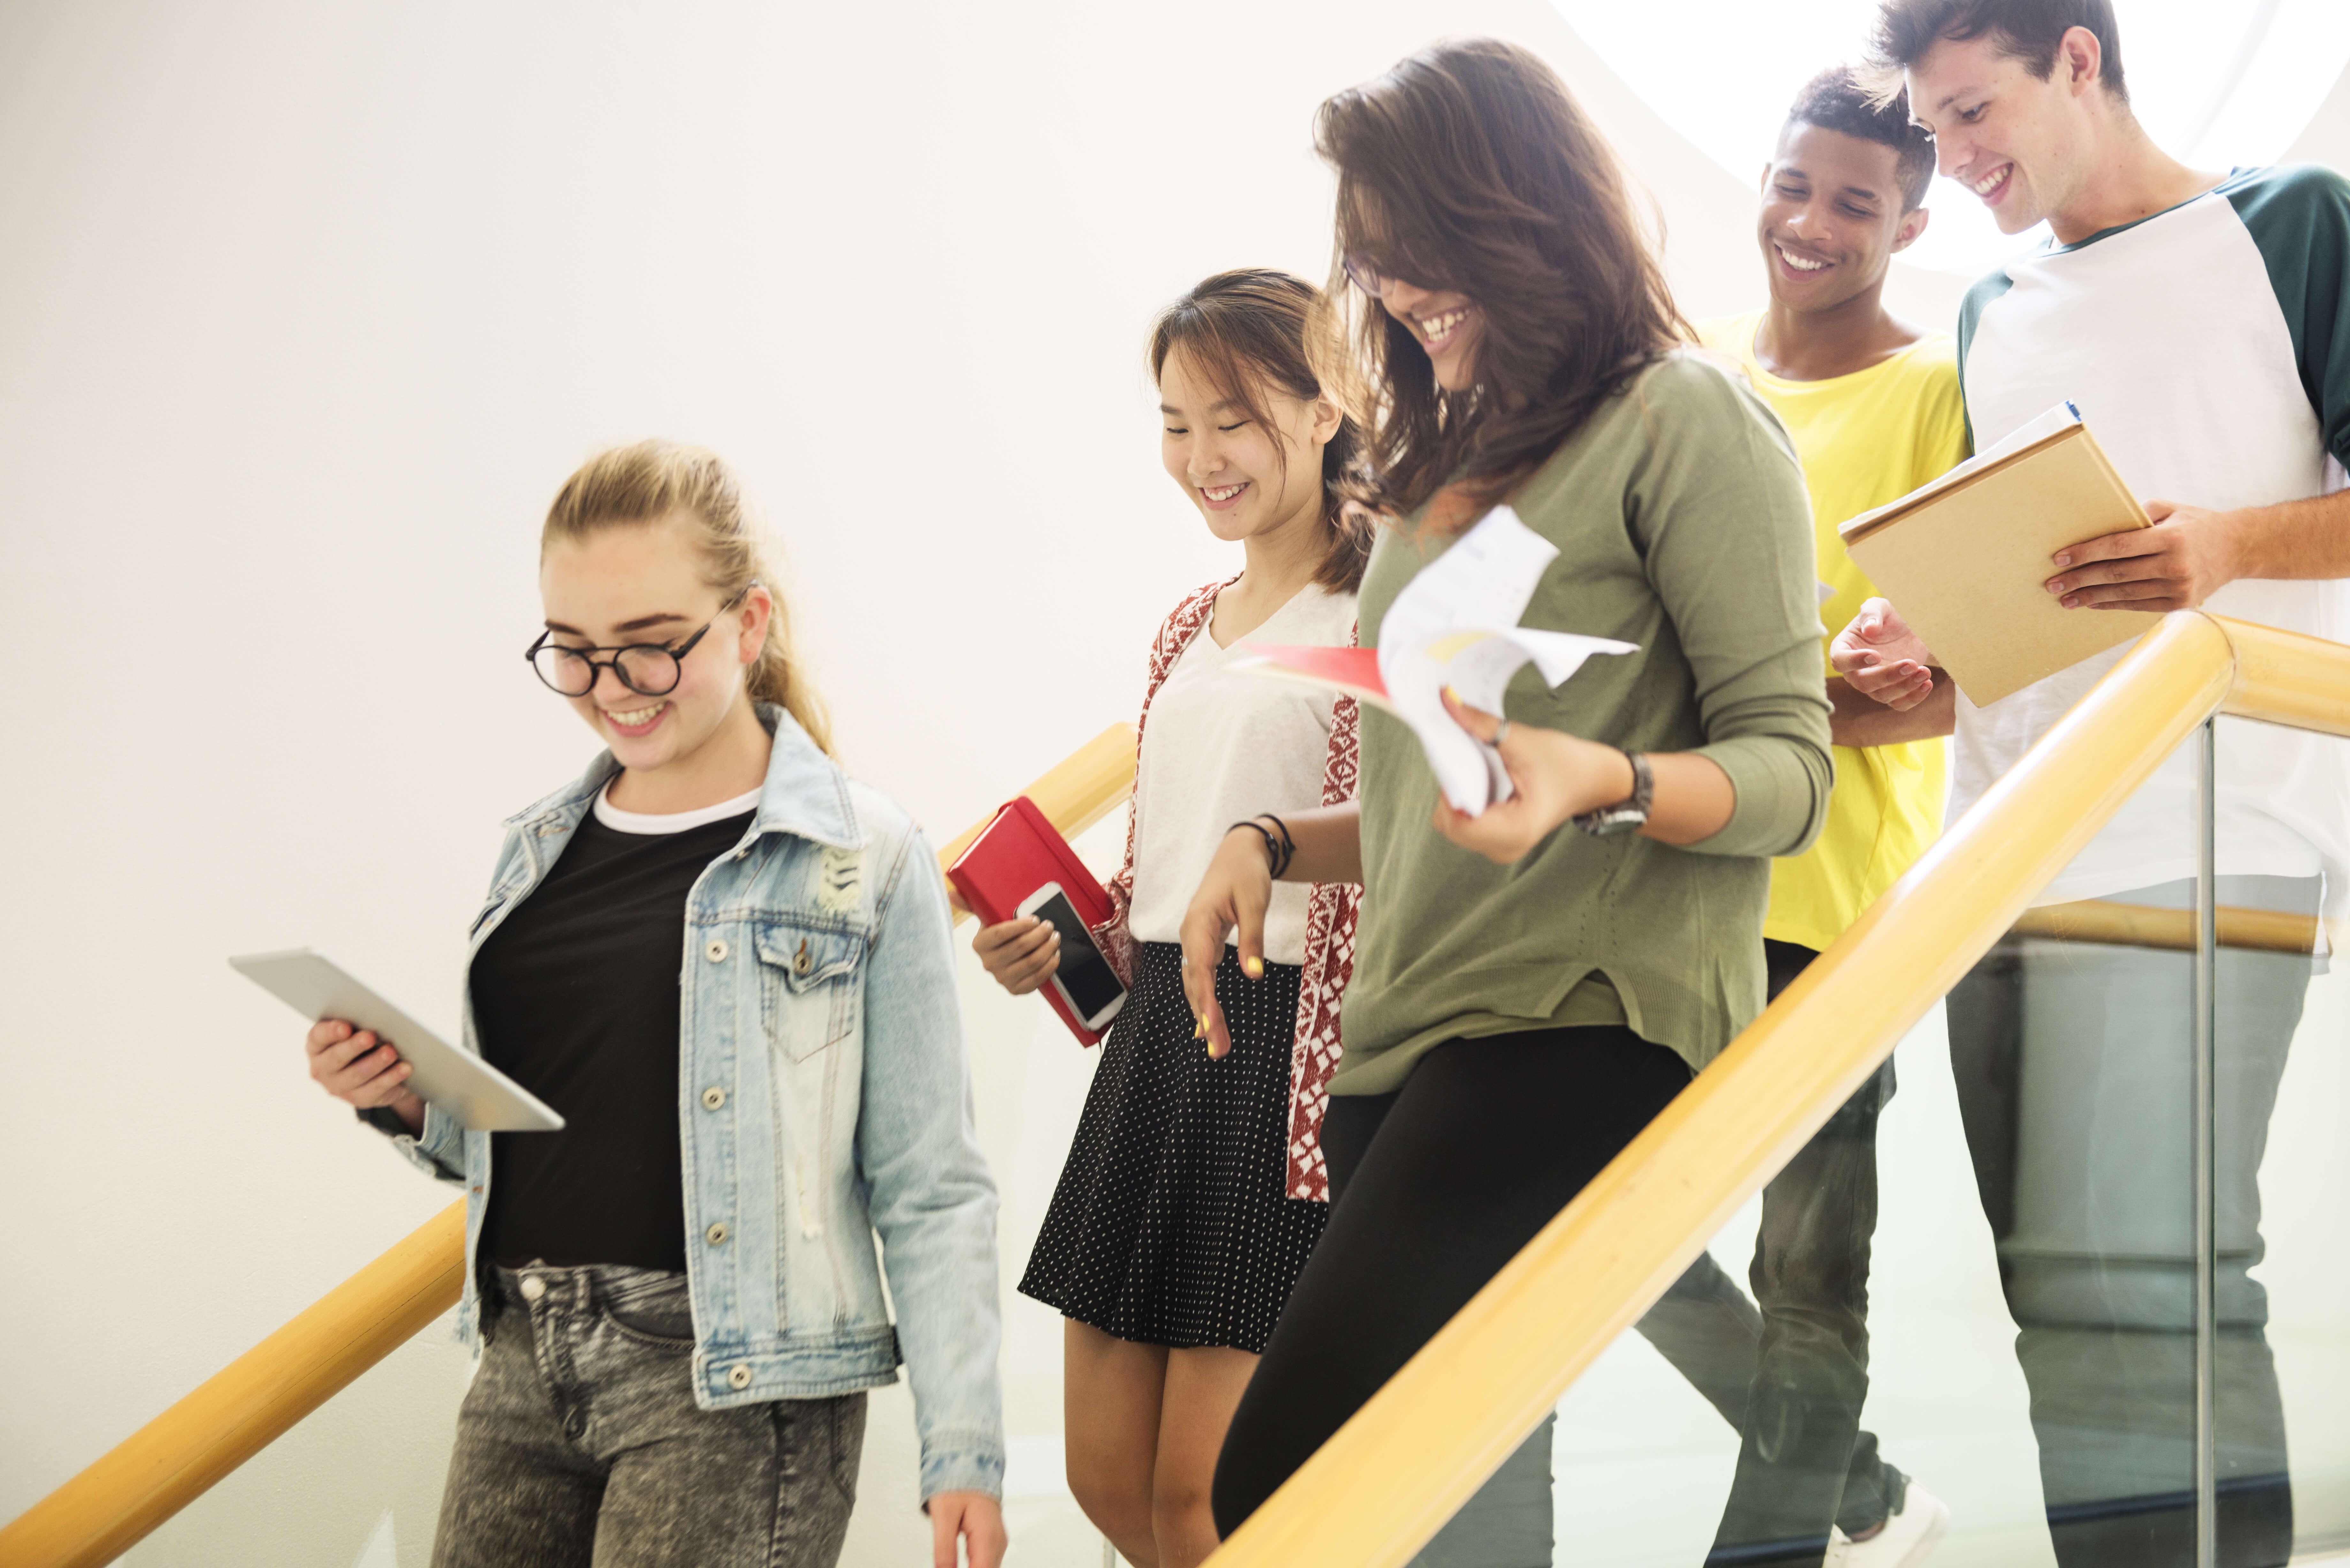 Community Colleges Are Gaining Popularity